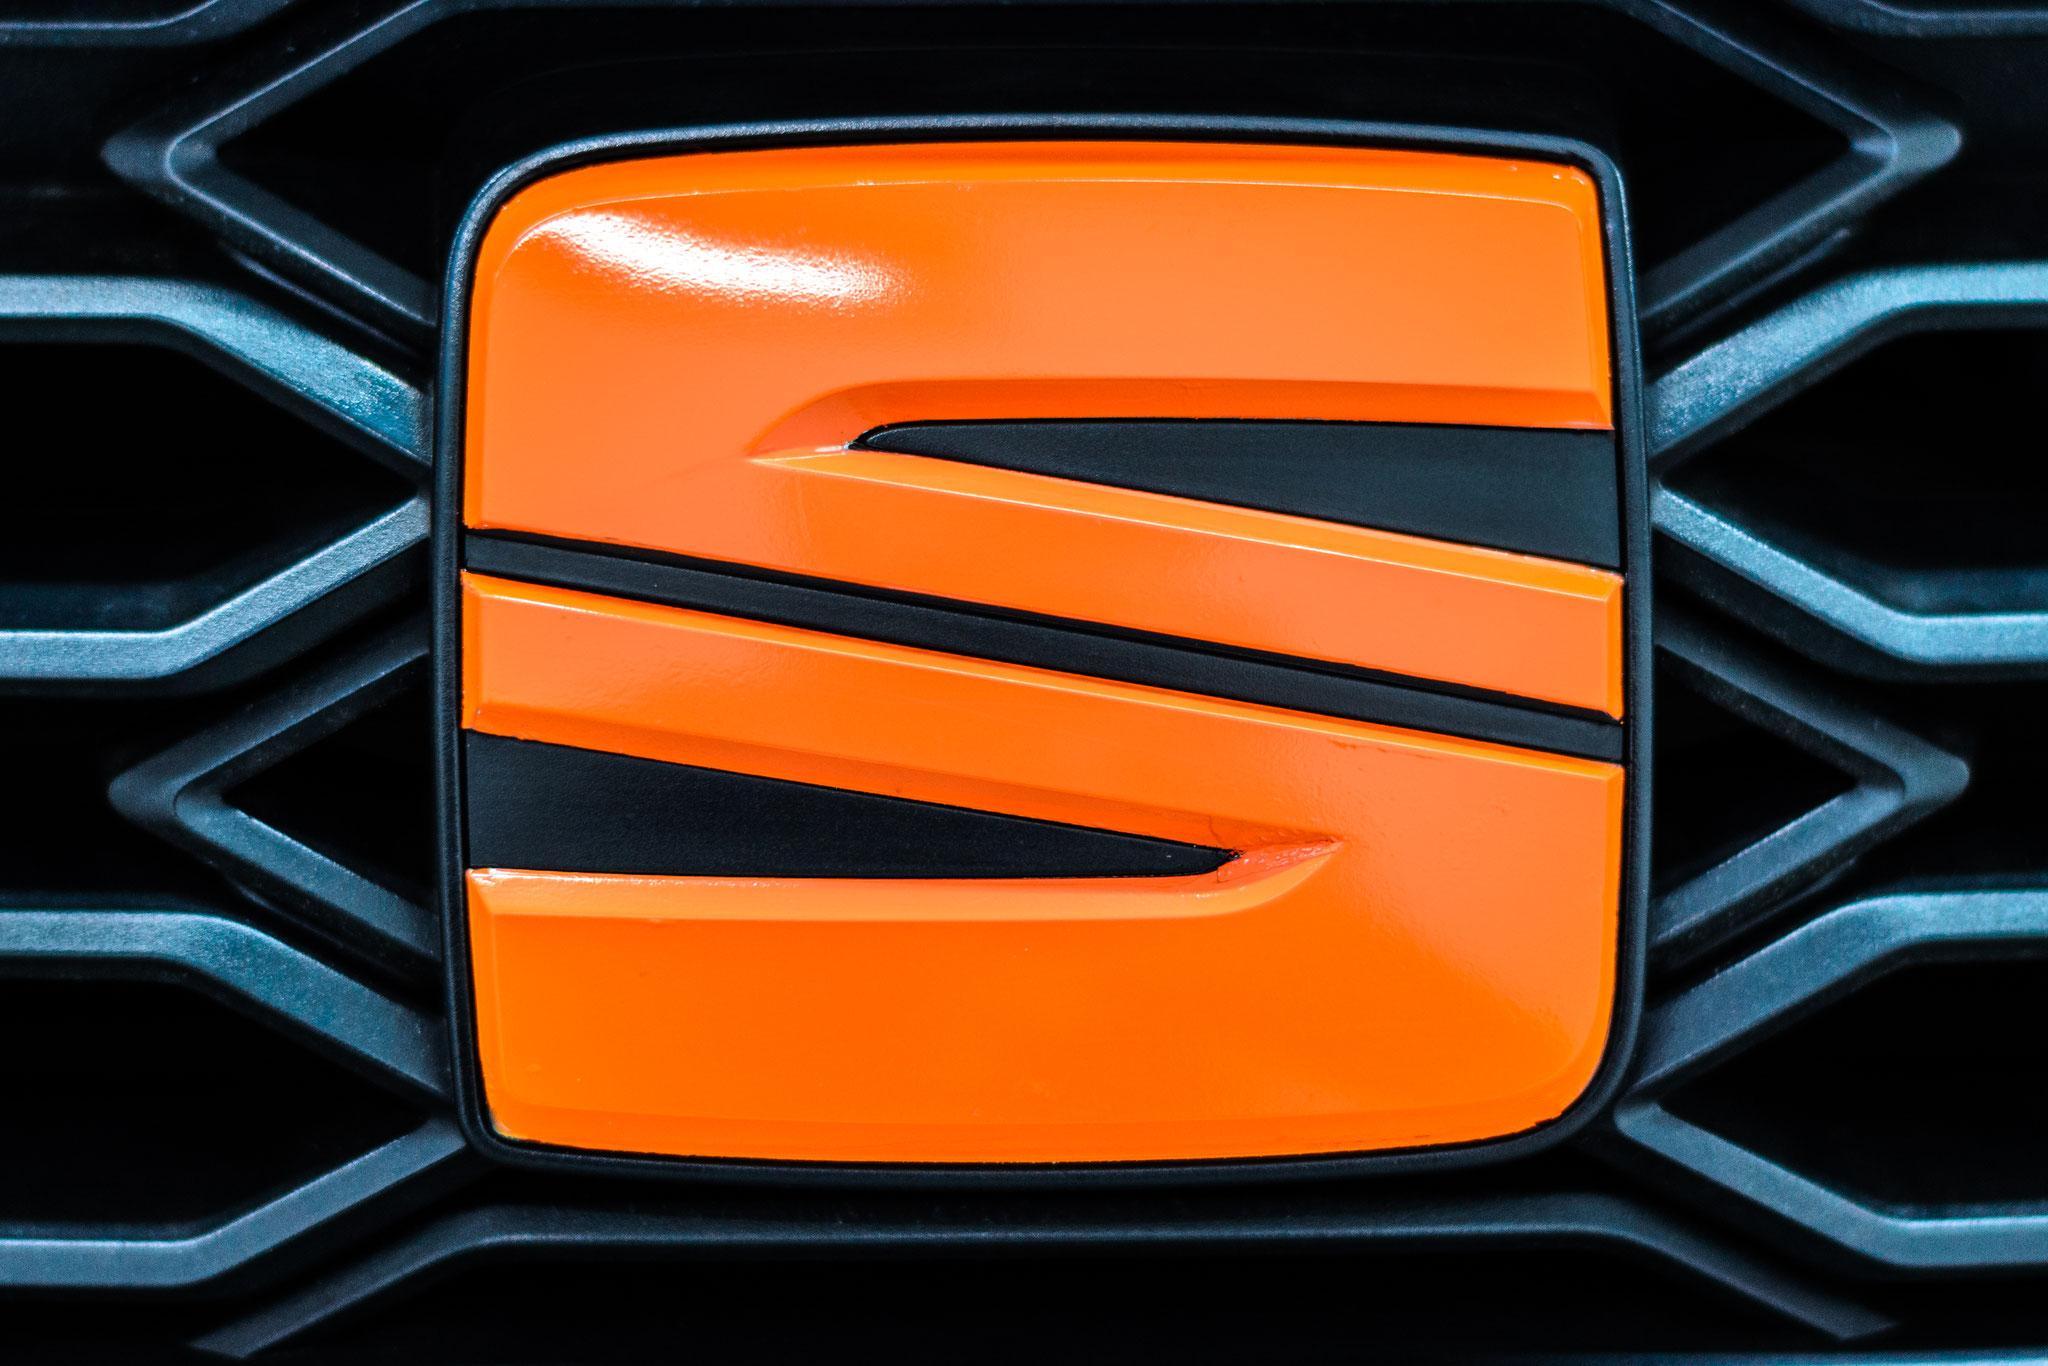 AVERY Supreme Wrapping Film Gloss Orange